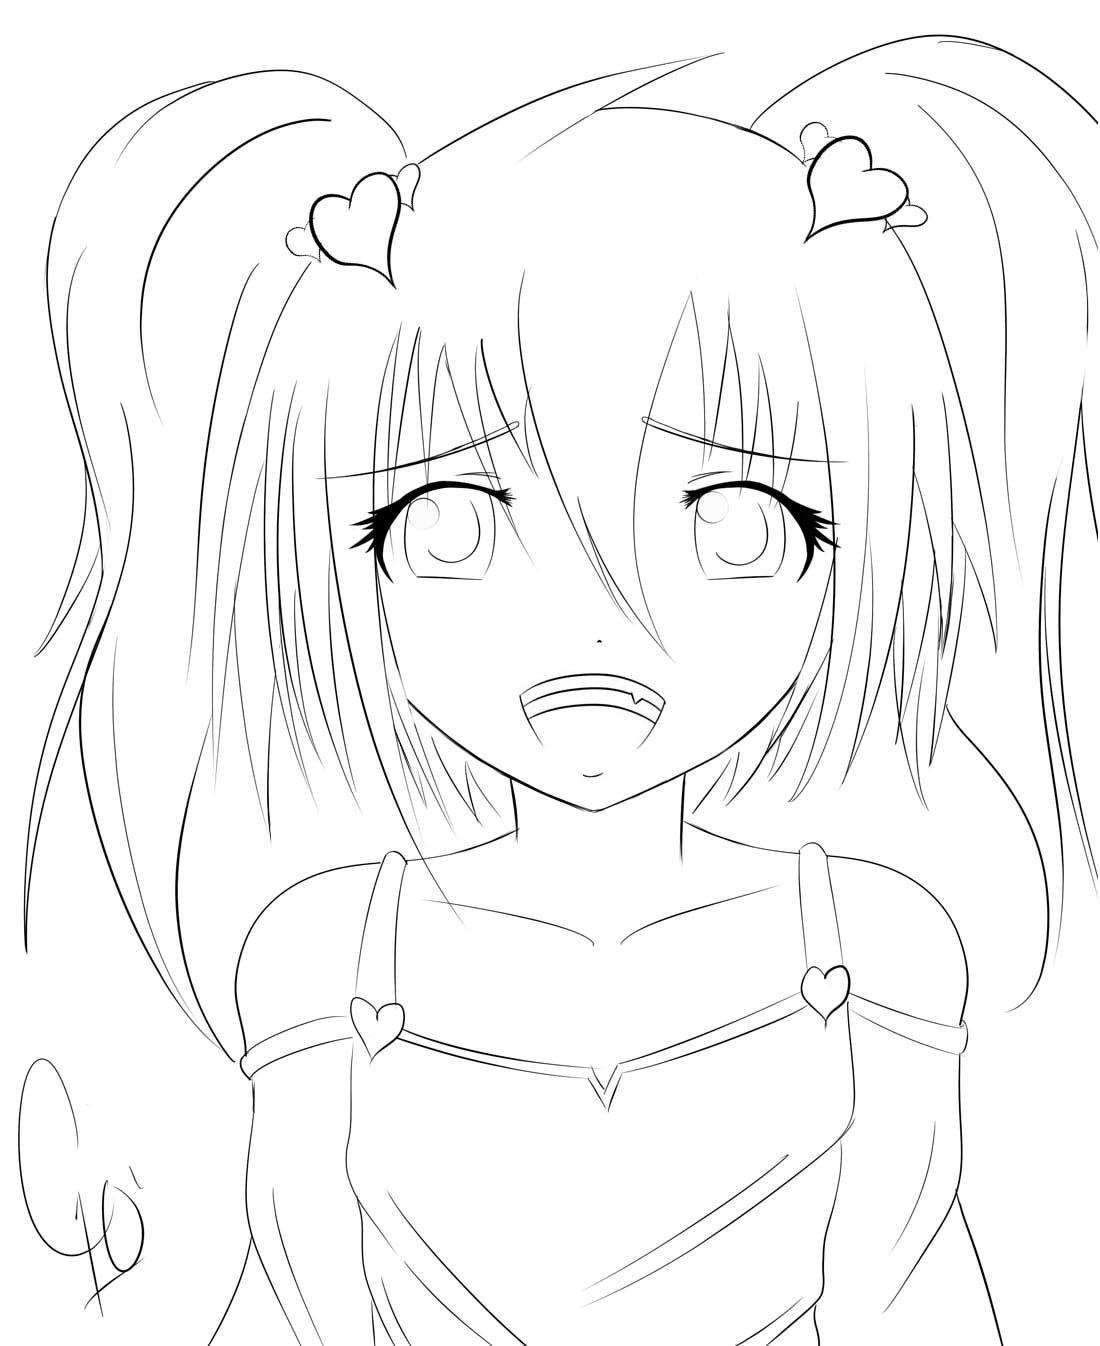 Cute Anime Girl By Chuloc On Deviantart